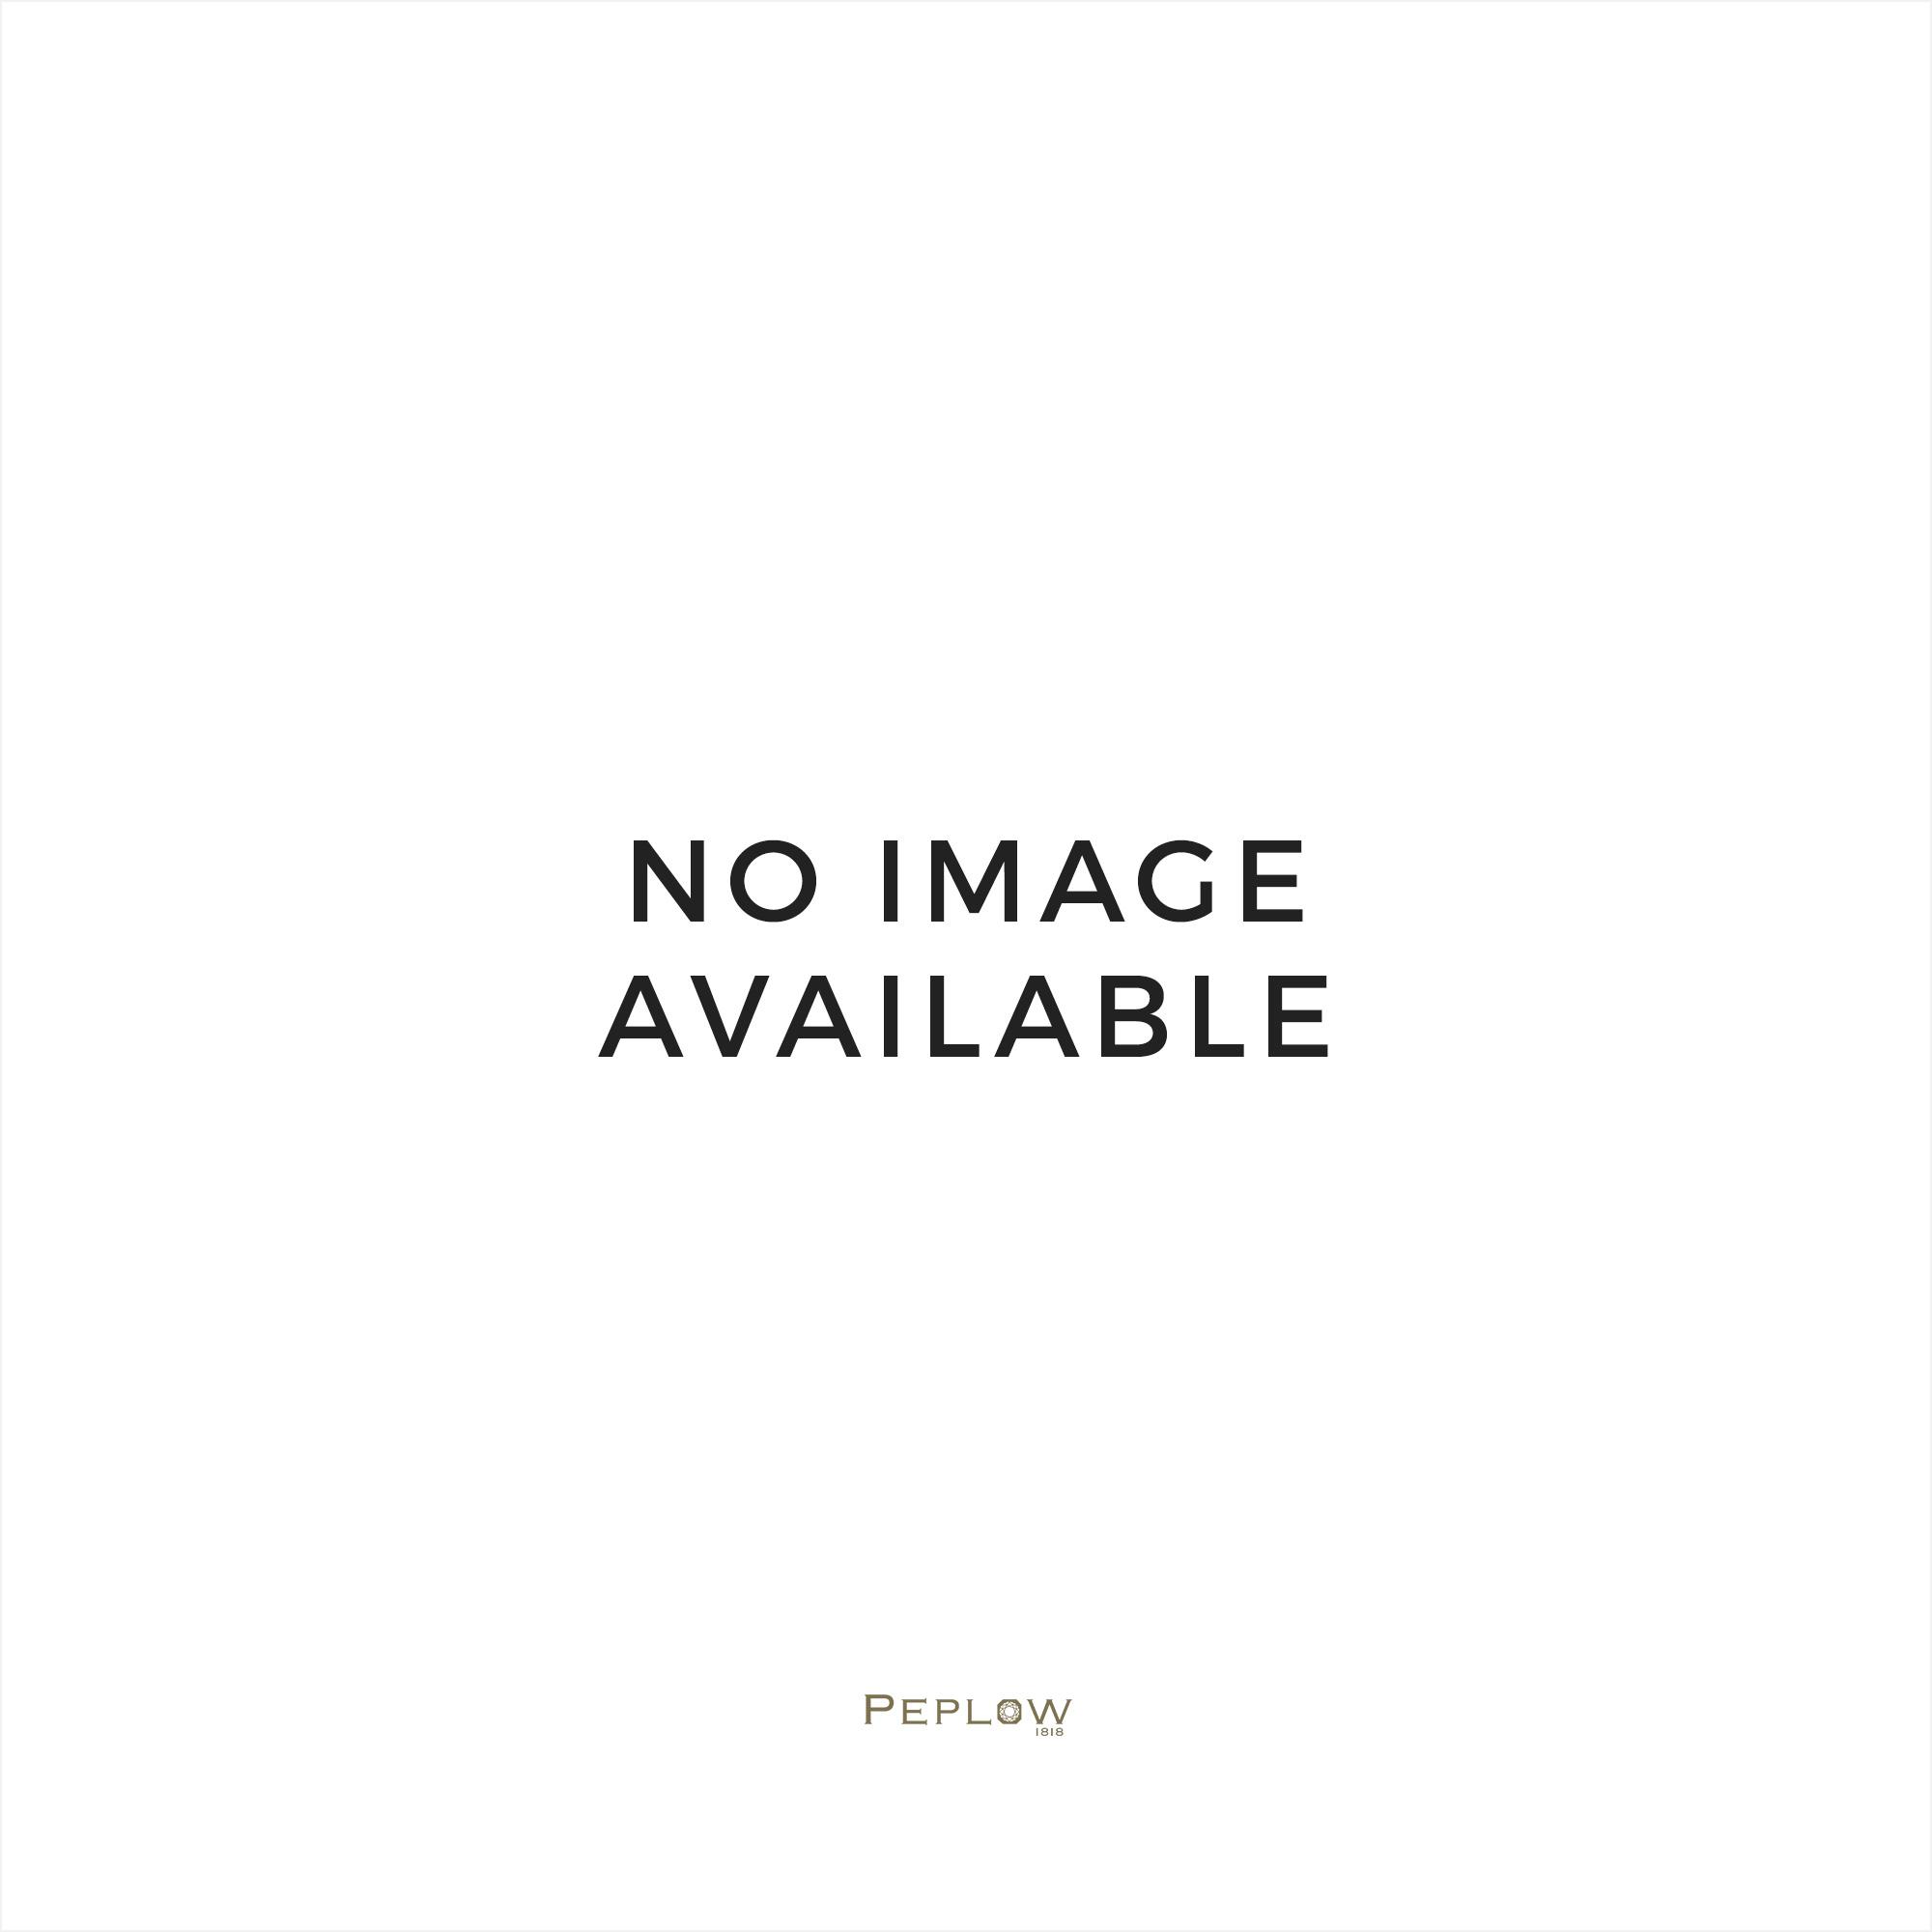 Seiko Gents Solar watch on Stainless Steel Bracelet SUN015P1